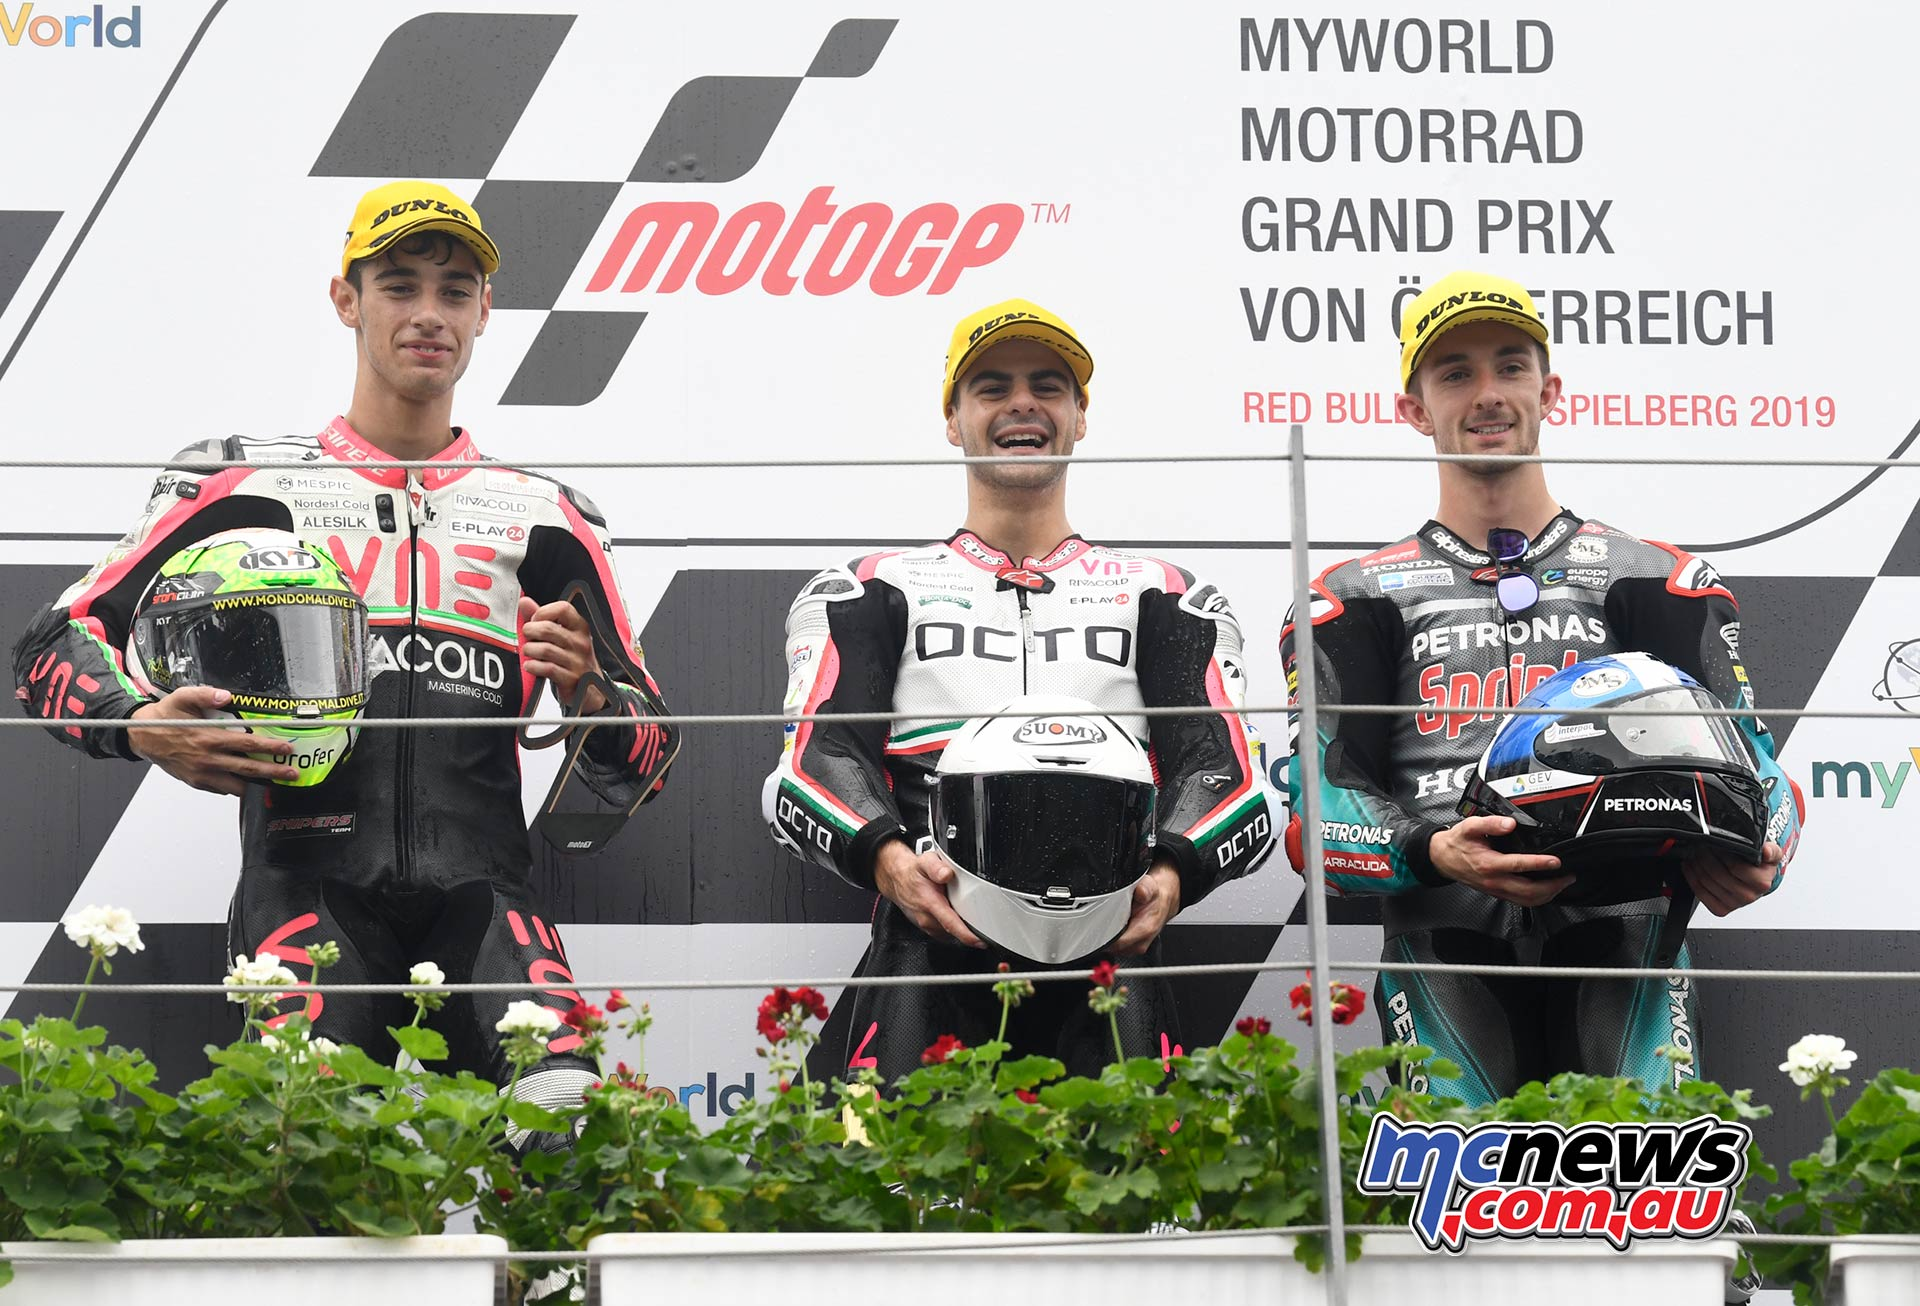 MotoGP Rnd RedBullRing Race Moto Arbolino Fenati McPhee